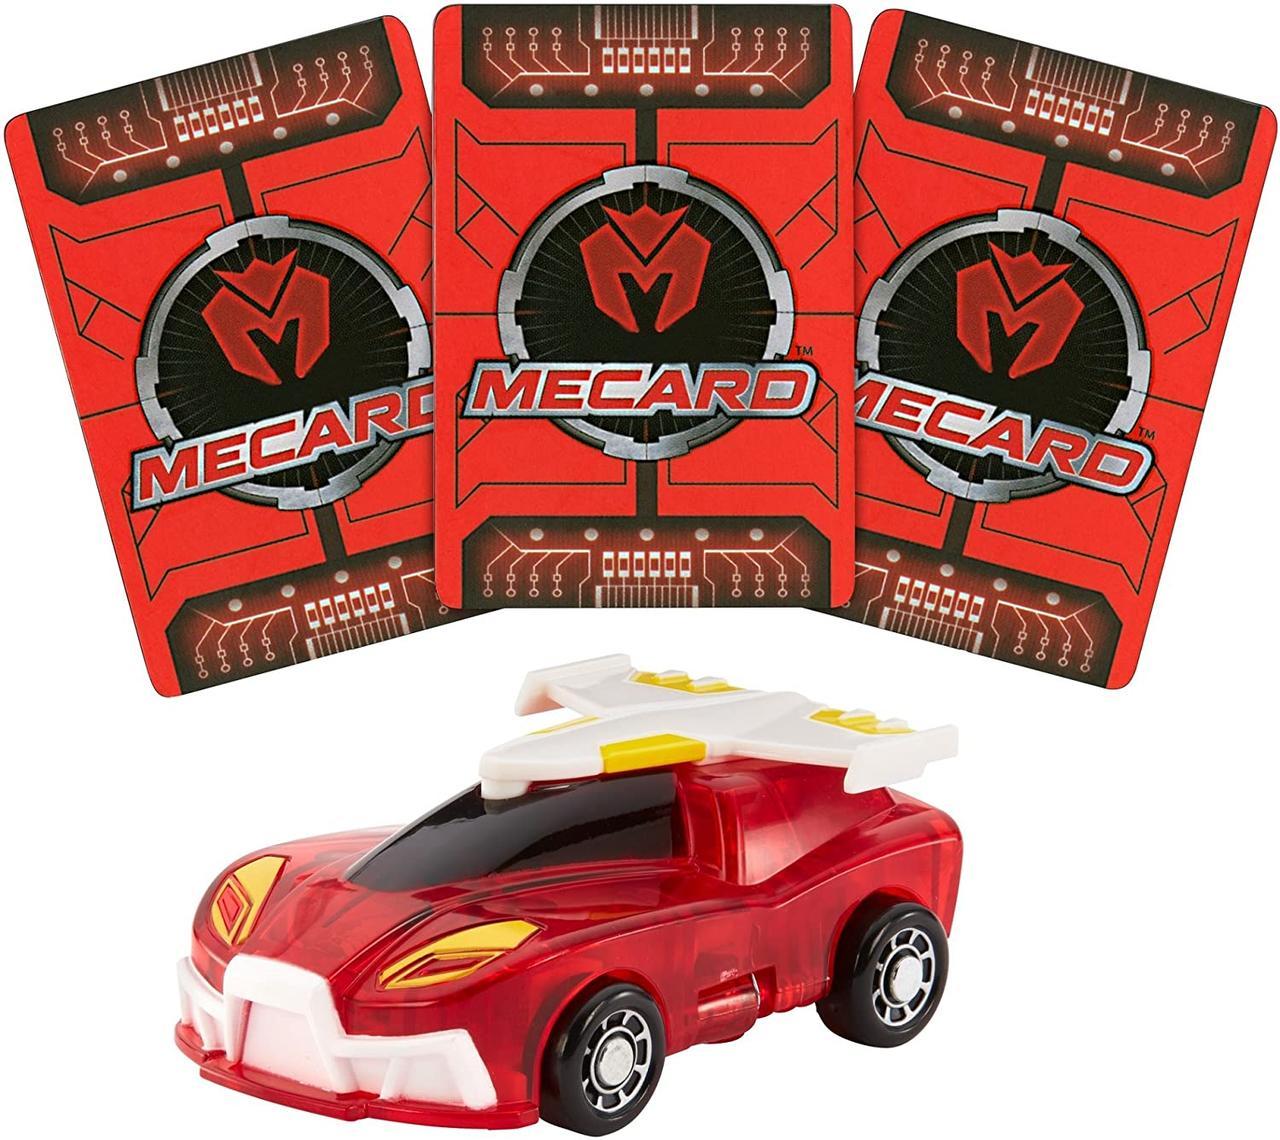 Машинка-трансформер Мекард Тадор Делюкс / Mecard Tador Deluxe / Mattel оригінал